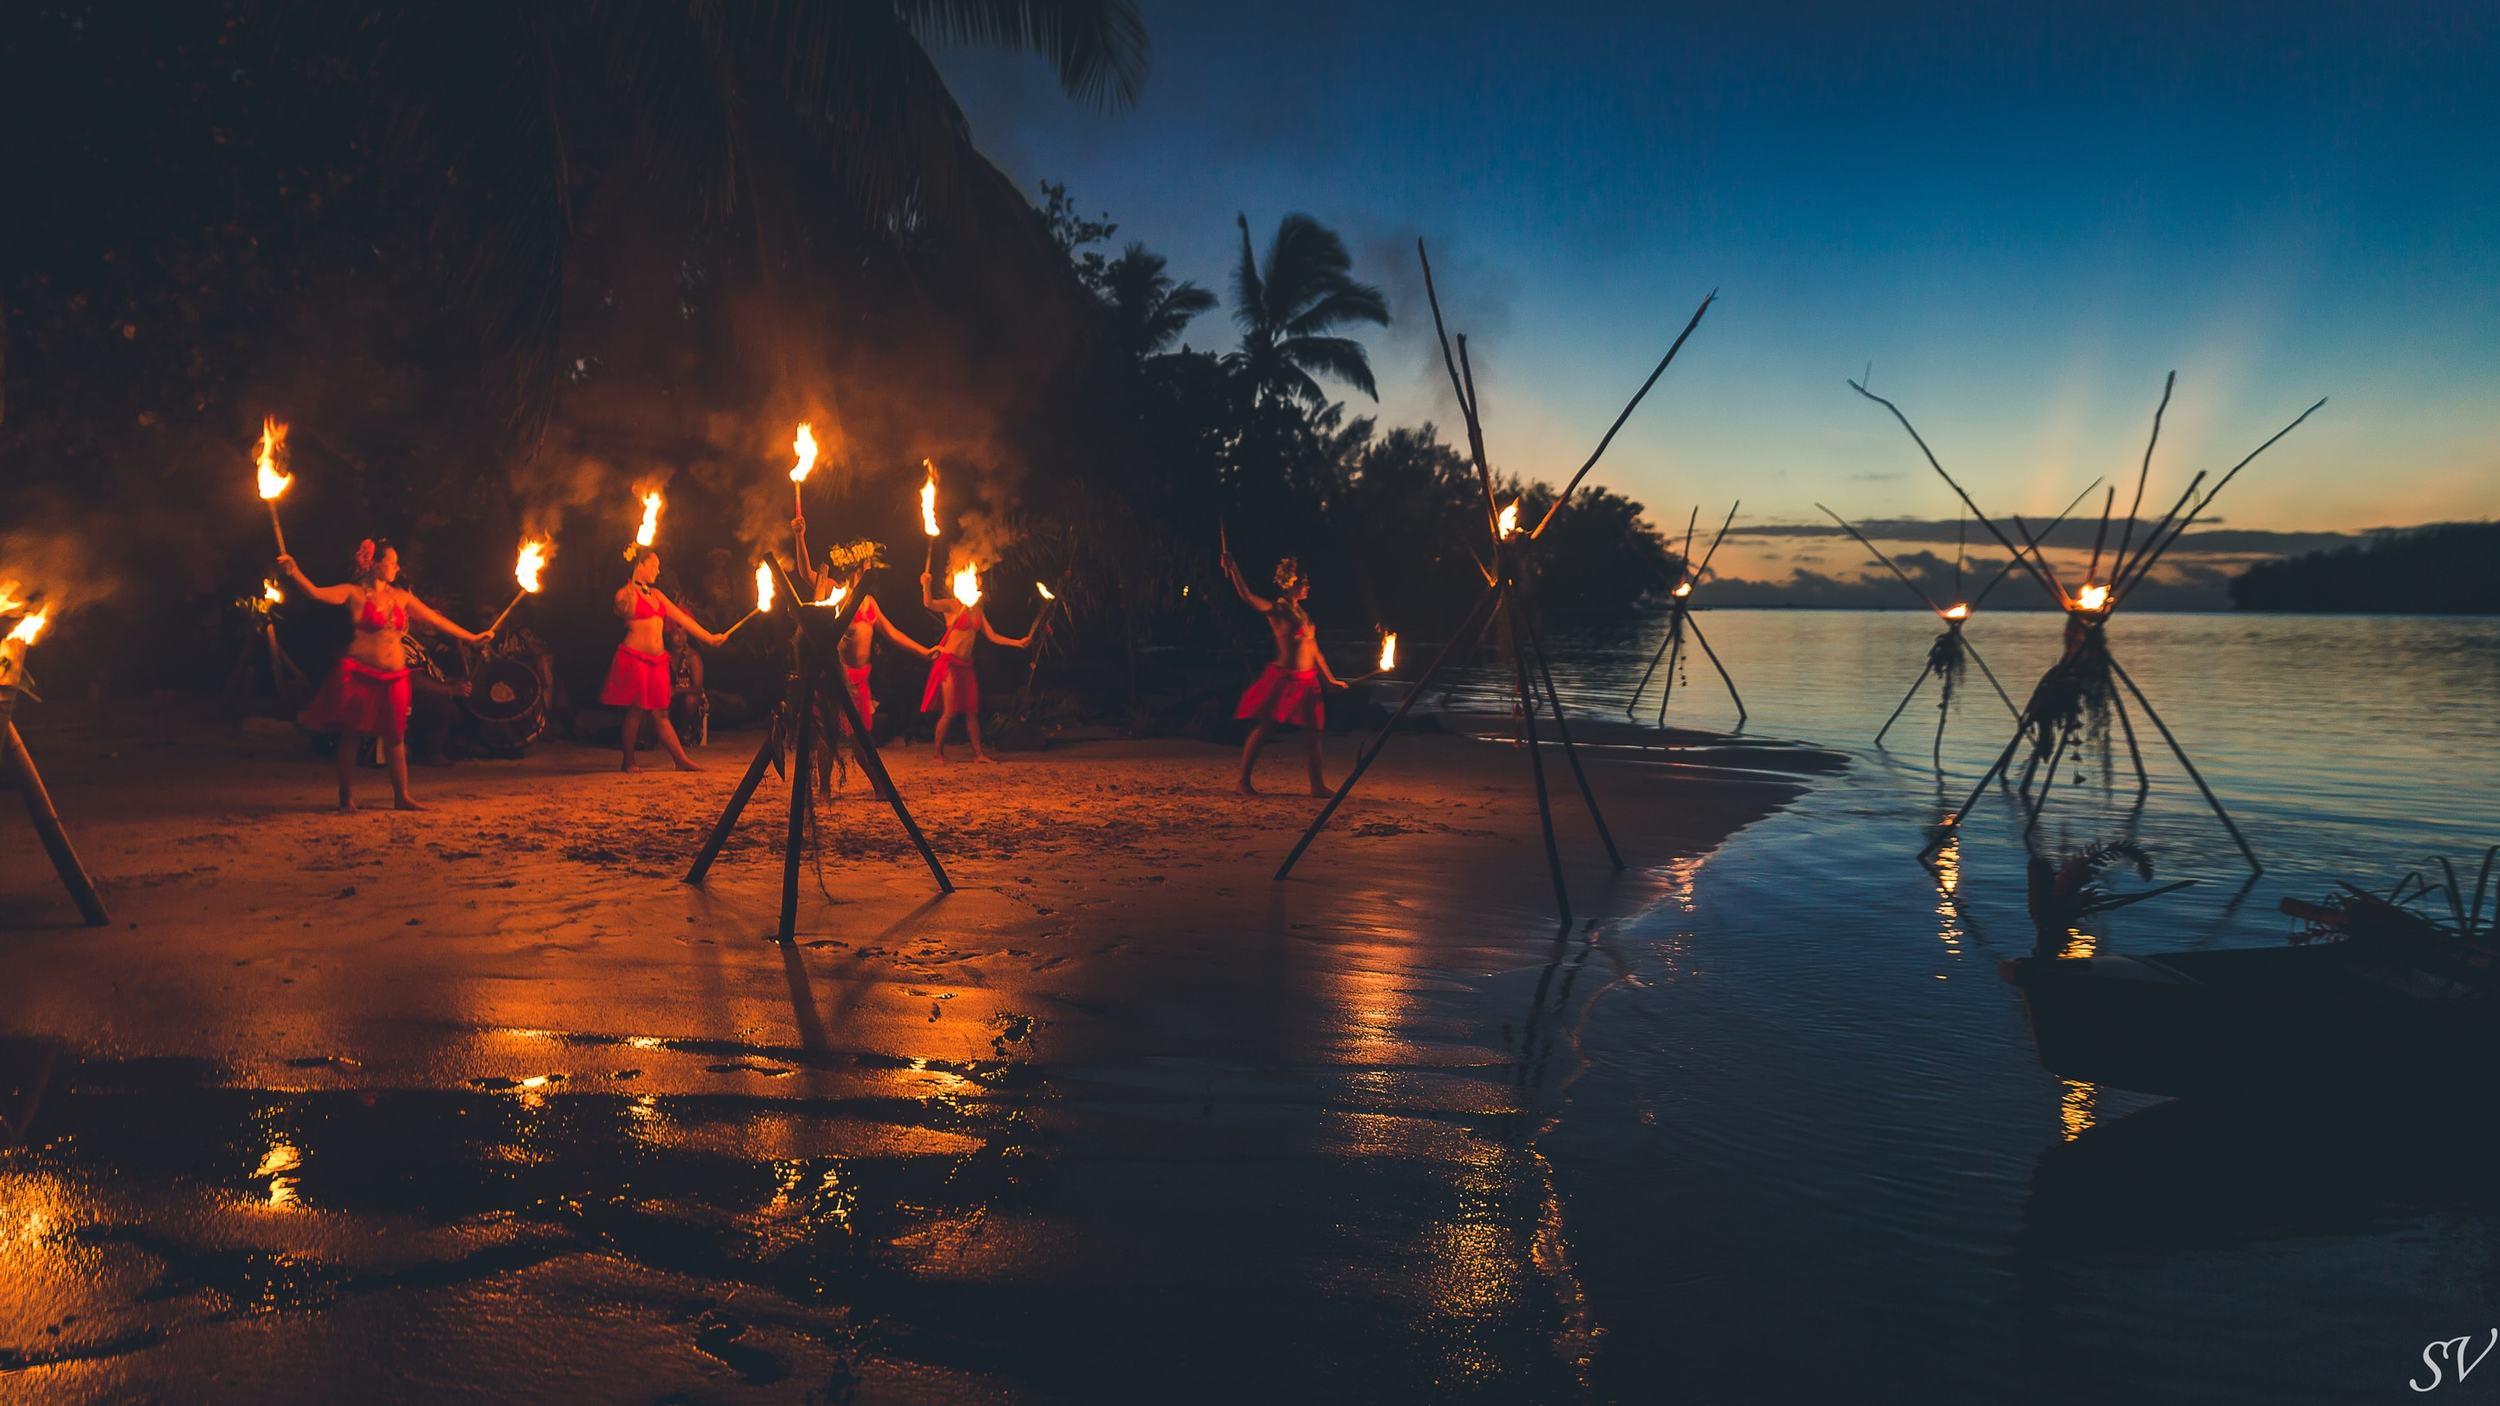 Fire dance on a private beach in Moorea, Tahiti